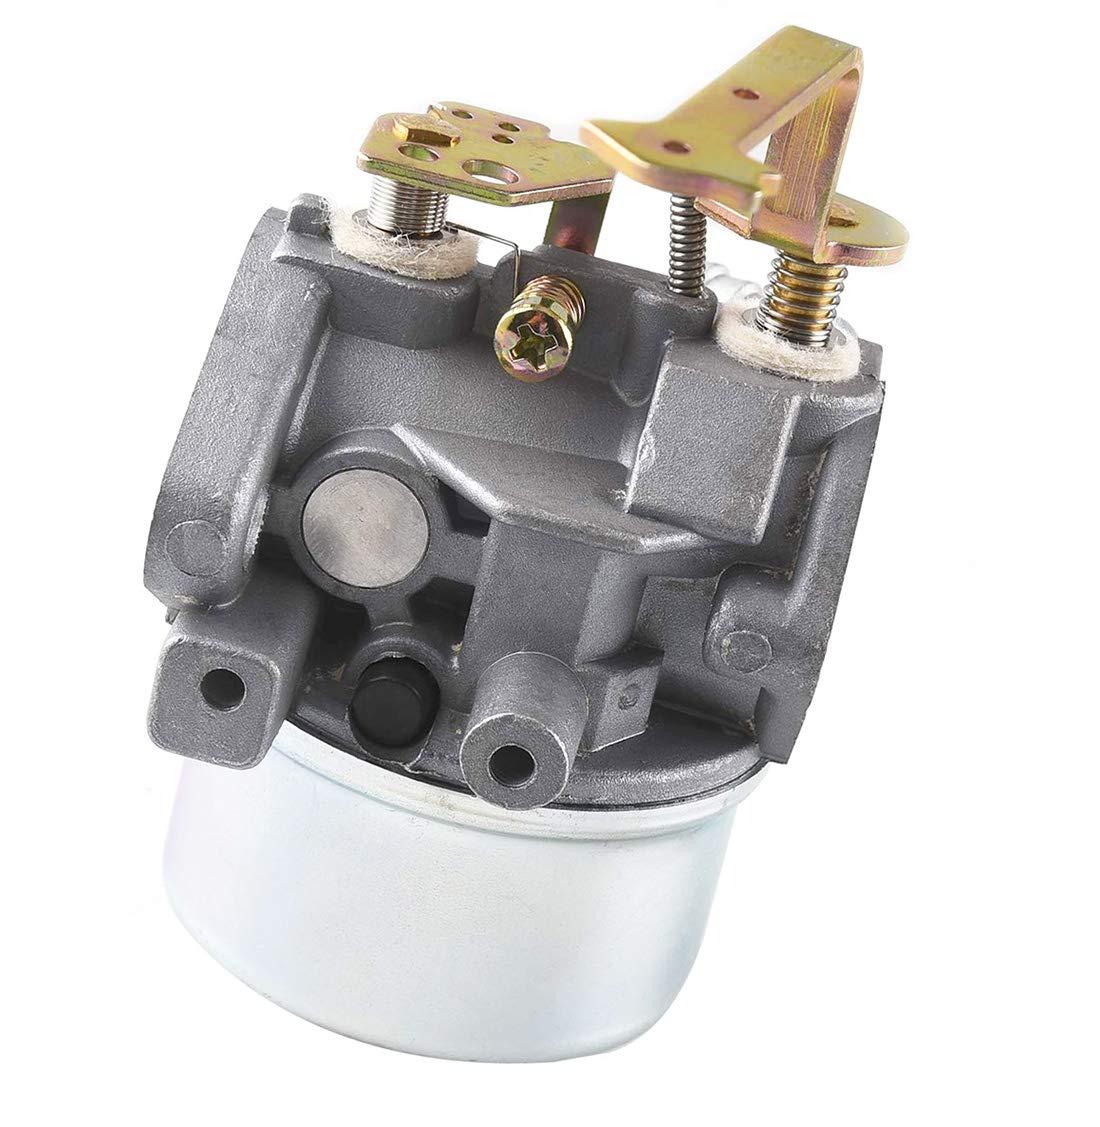 Spark Plug for Tecumseh 640152A 640023 640051 640140 640152 HM80 HM90 HM100 8-10 HP Engine Snow Blower Mower 5000w Generator LEIMO 640152 Carburetor kit Including 33268 Air Filter